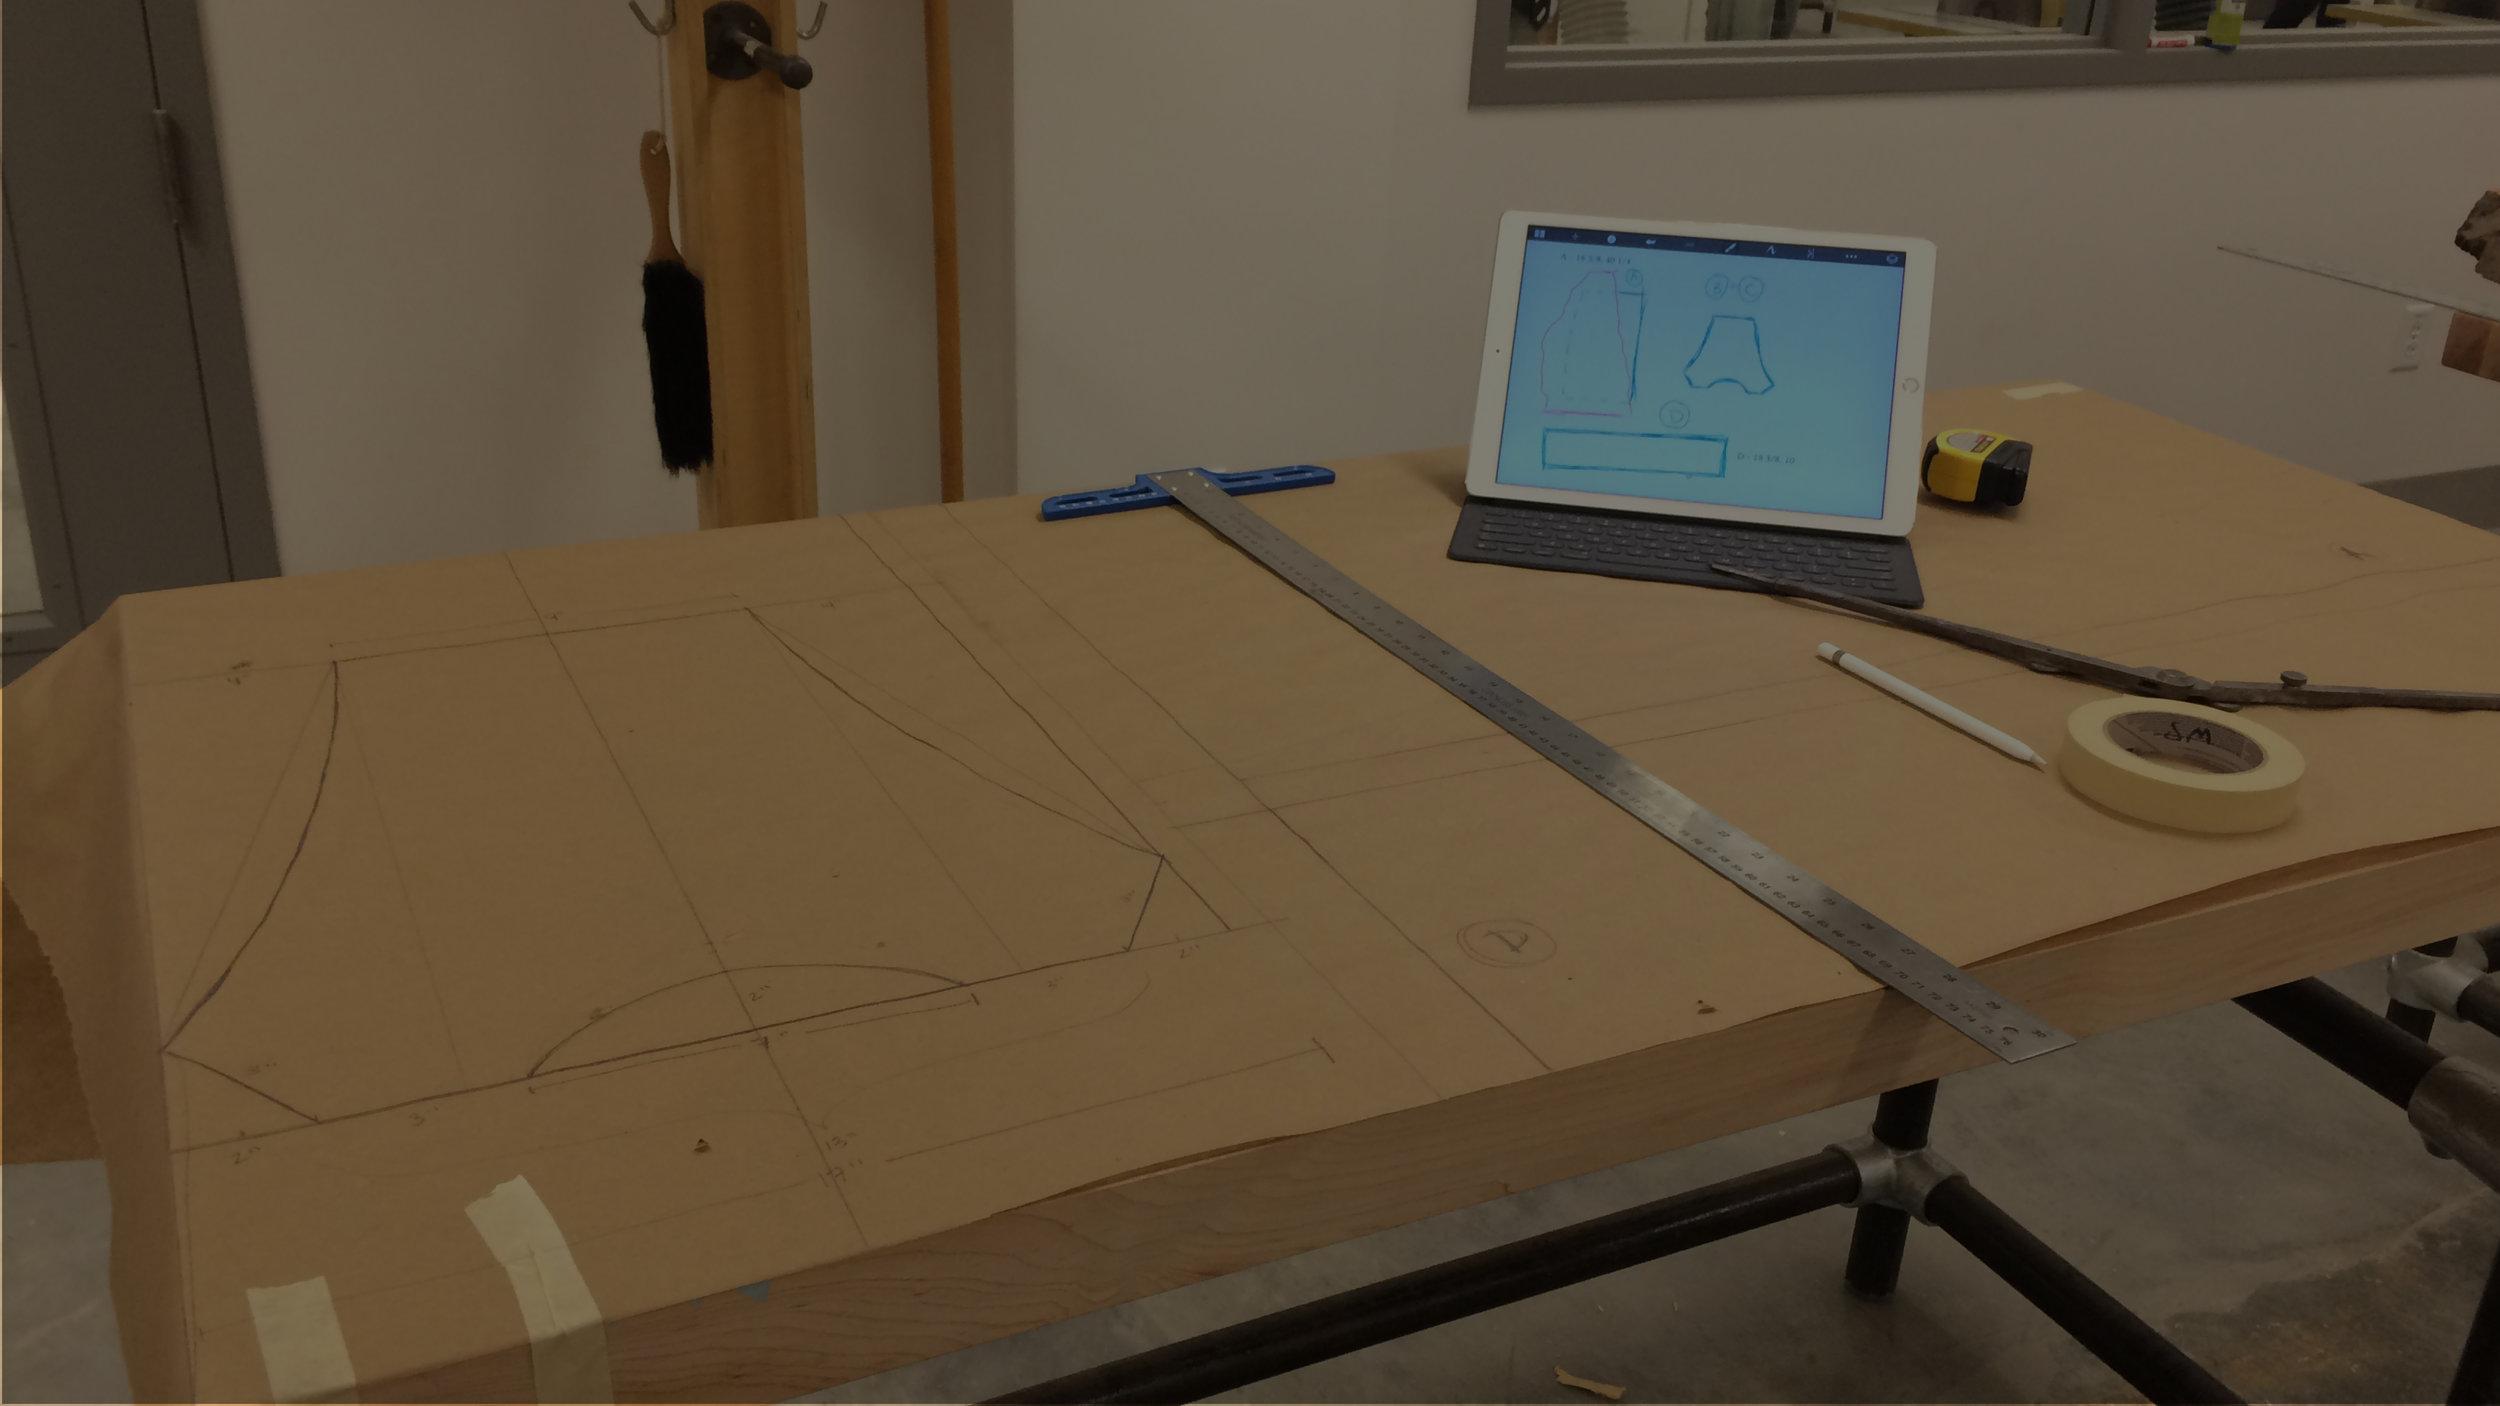 REDWOOD TABLE - Design to highlight natural live edgesSpring 2017